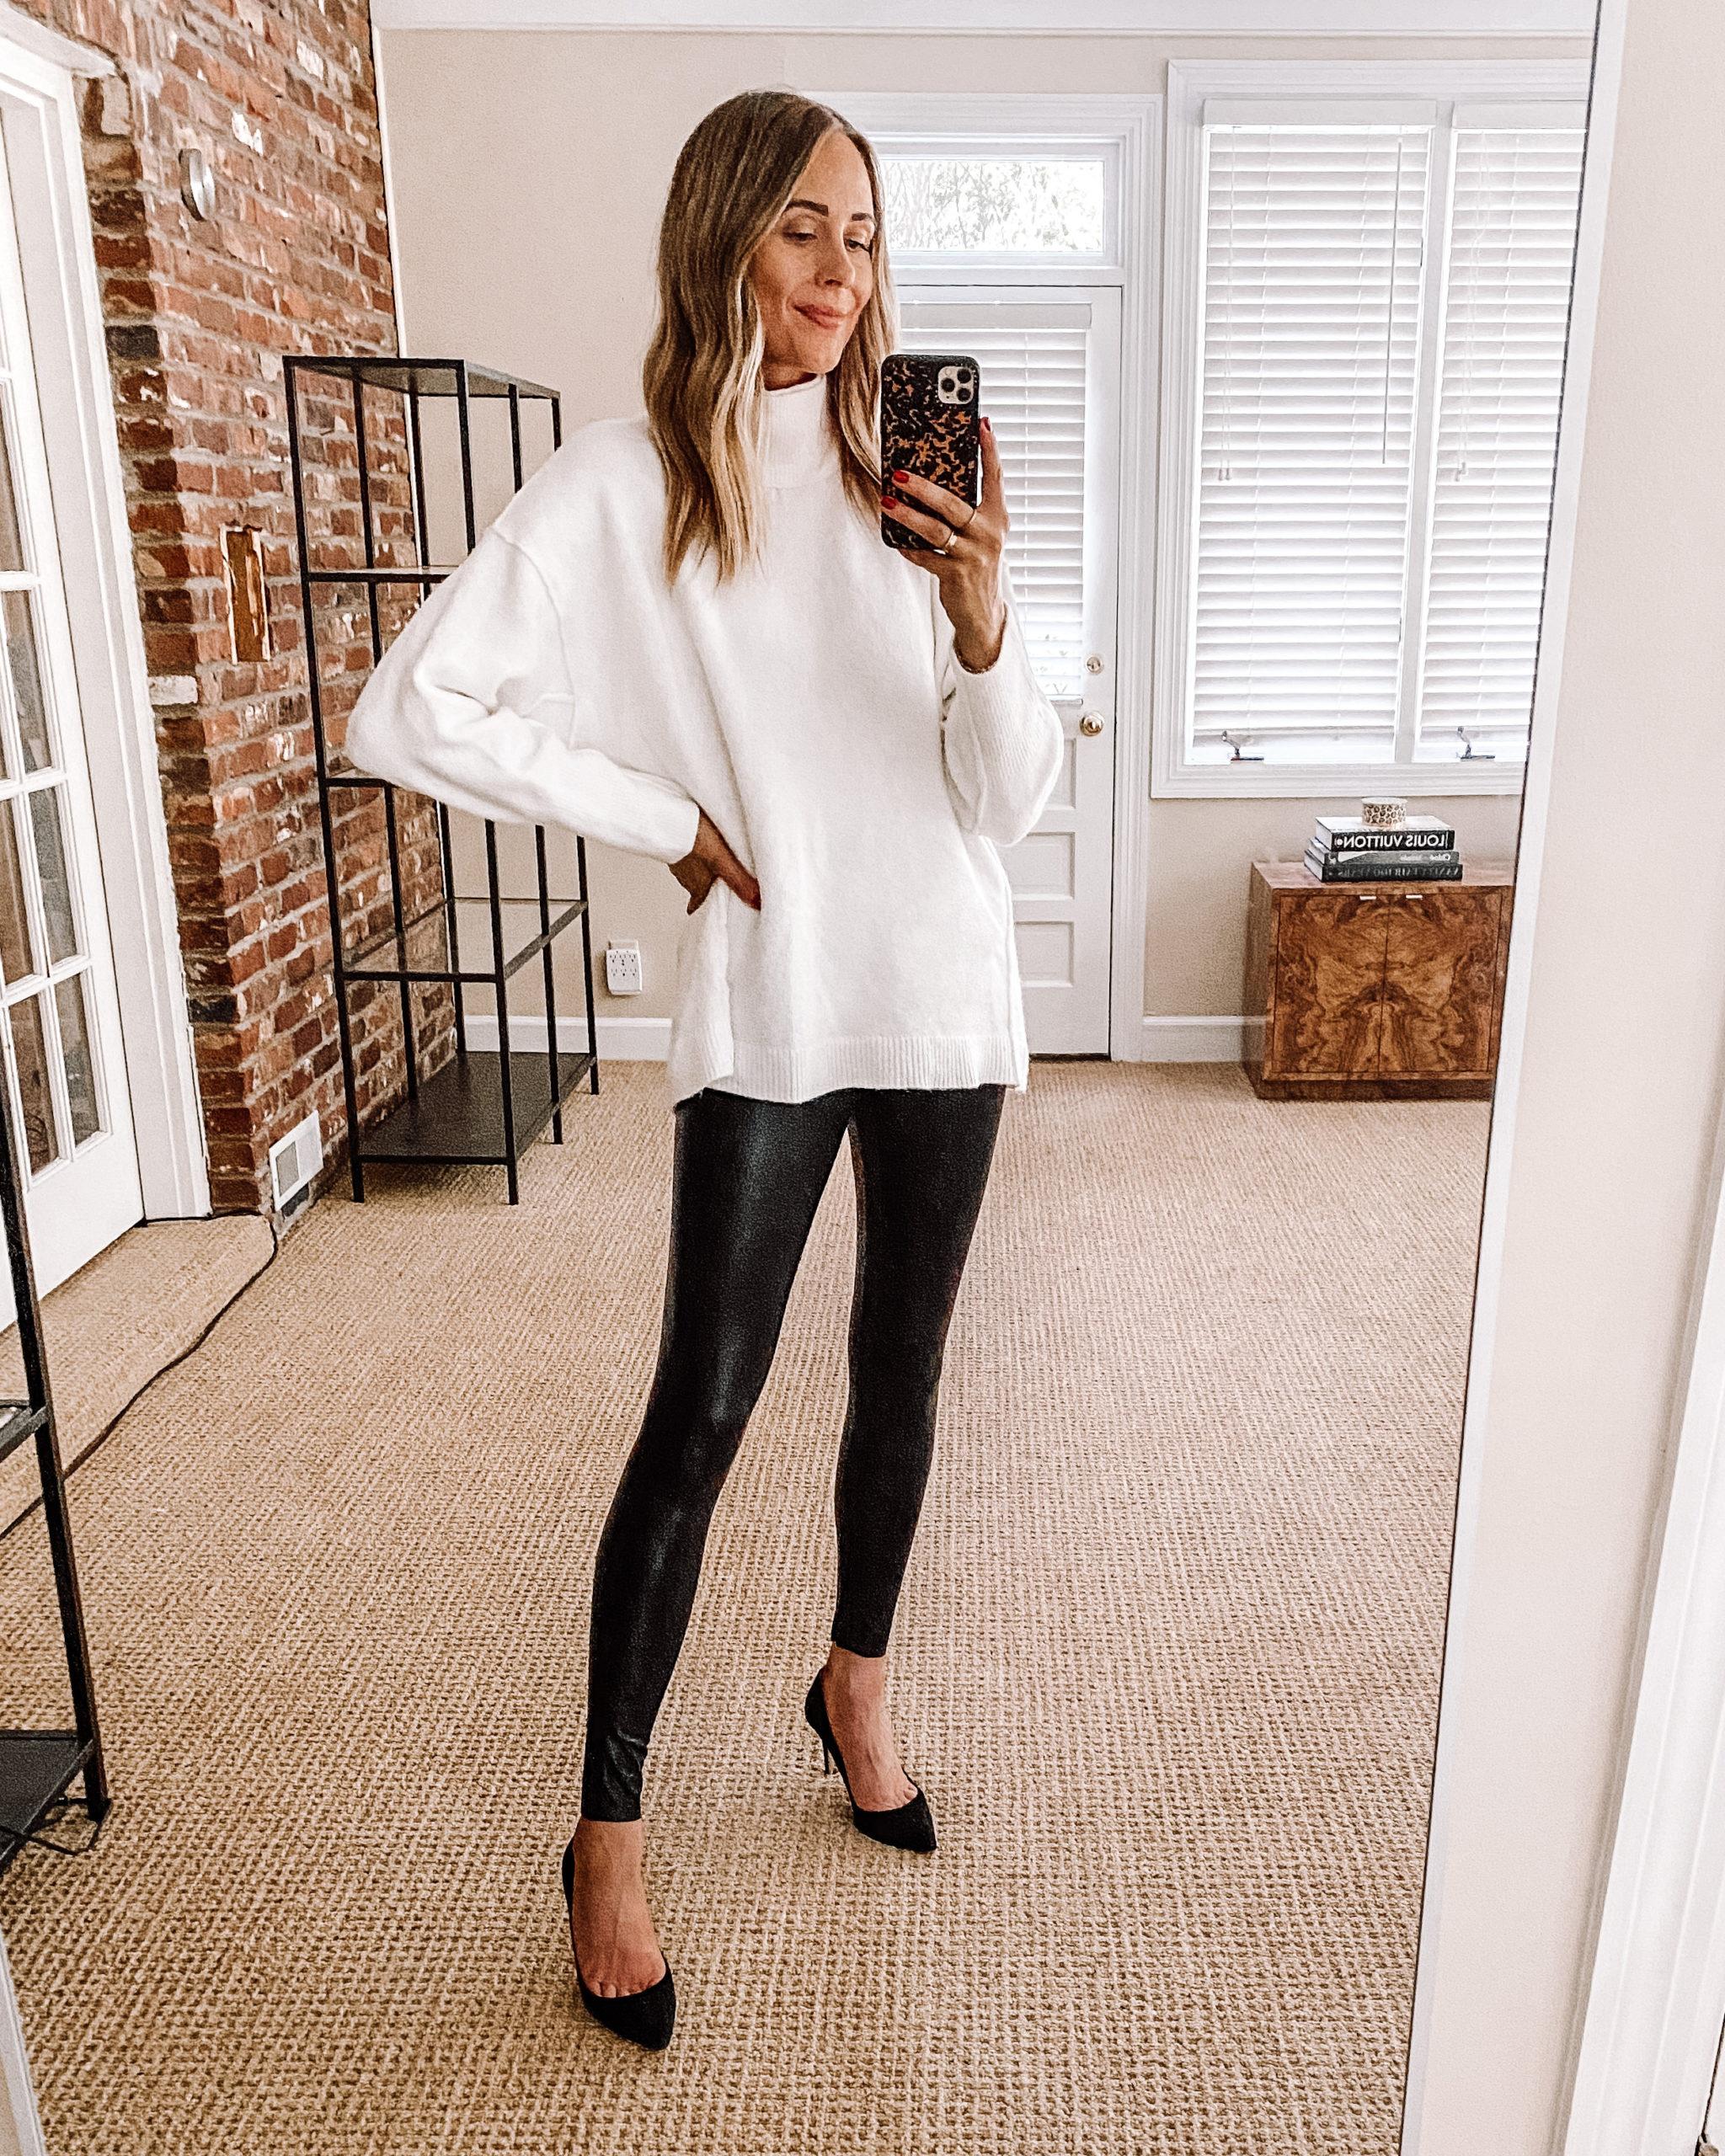 Fashion Jackson Nordstrom Anniversary Sale Free People Afterglow Mock Neck Top White Tunic Sweater Commando Leggings Black Pumps